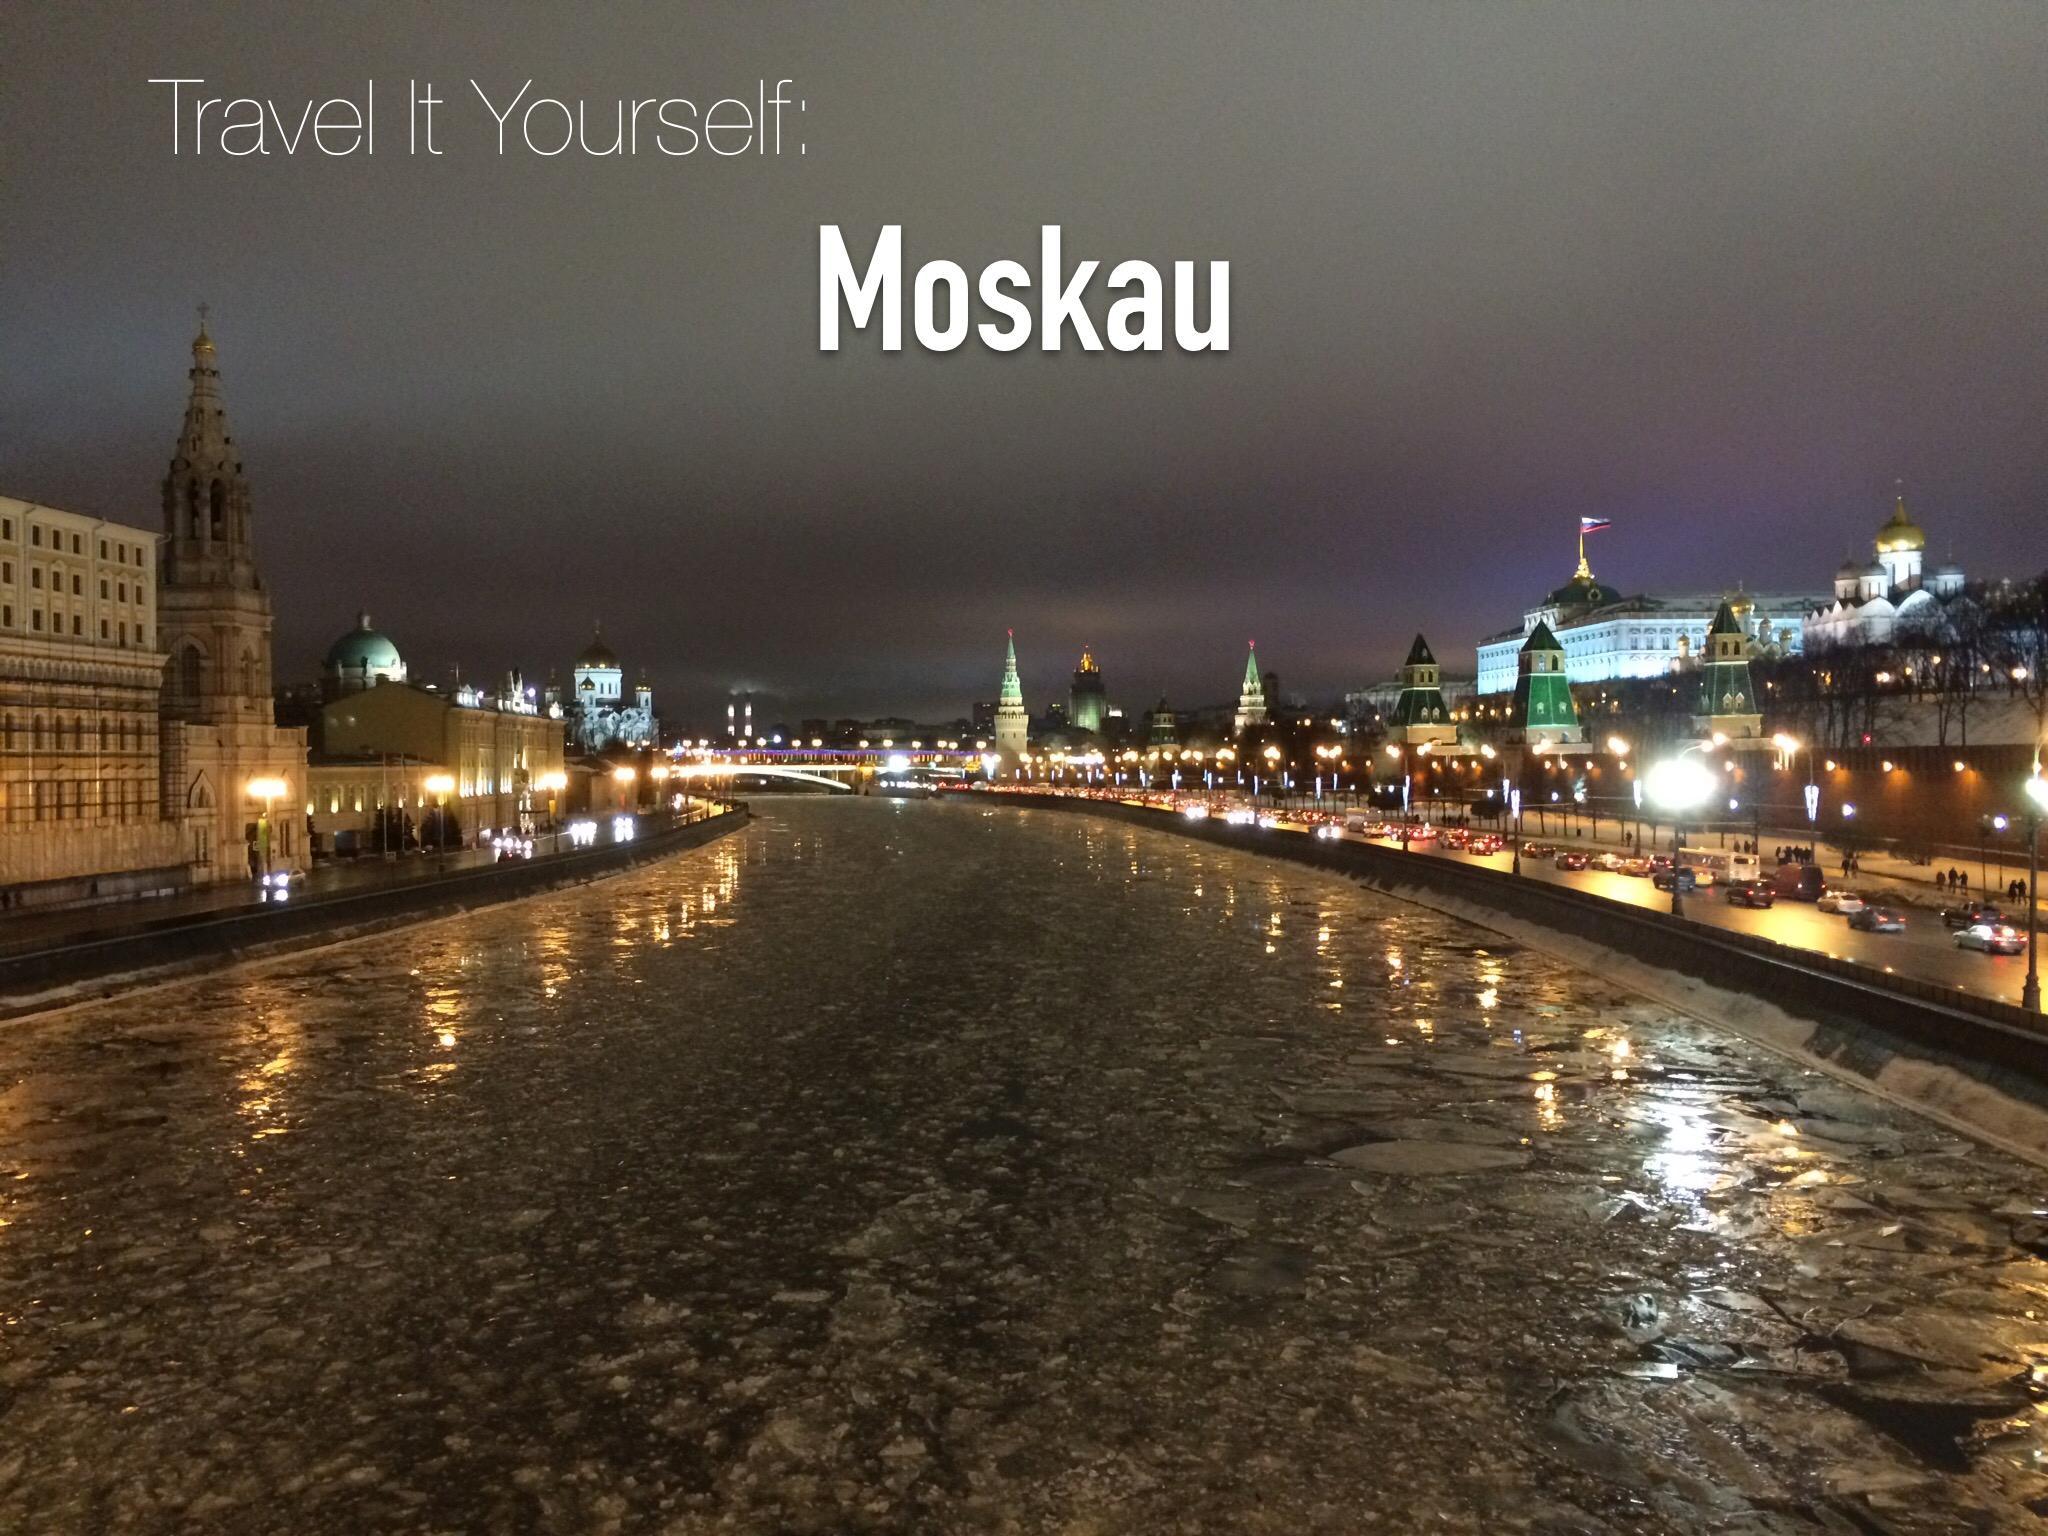 Tipps Tricks günstig Moskau Urlaub